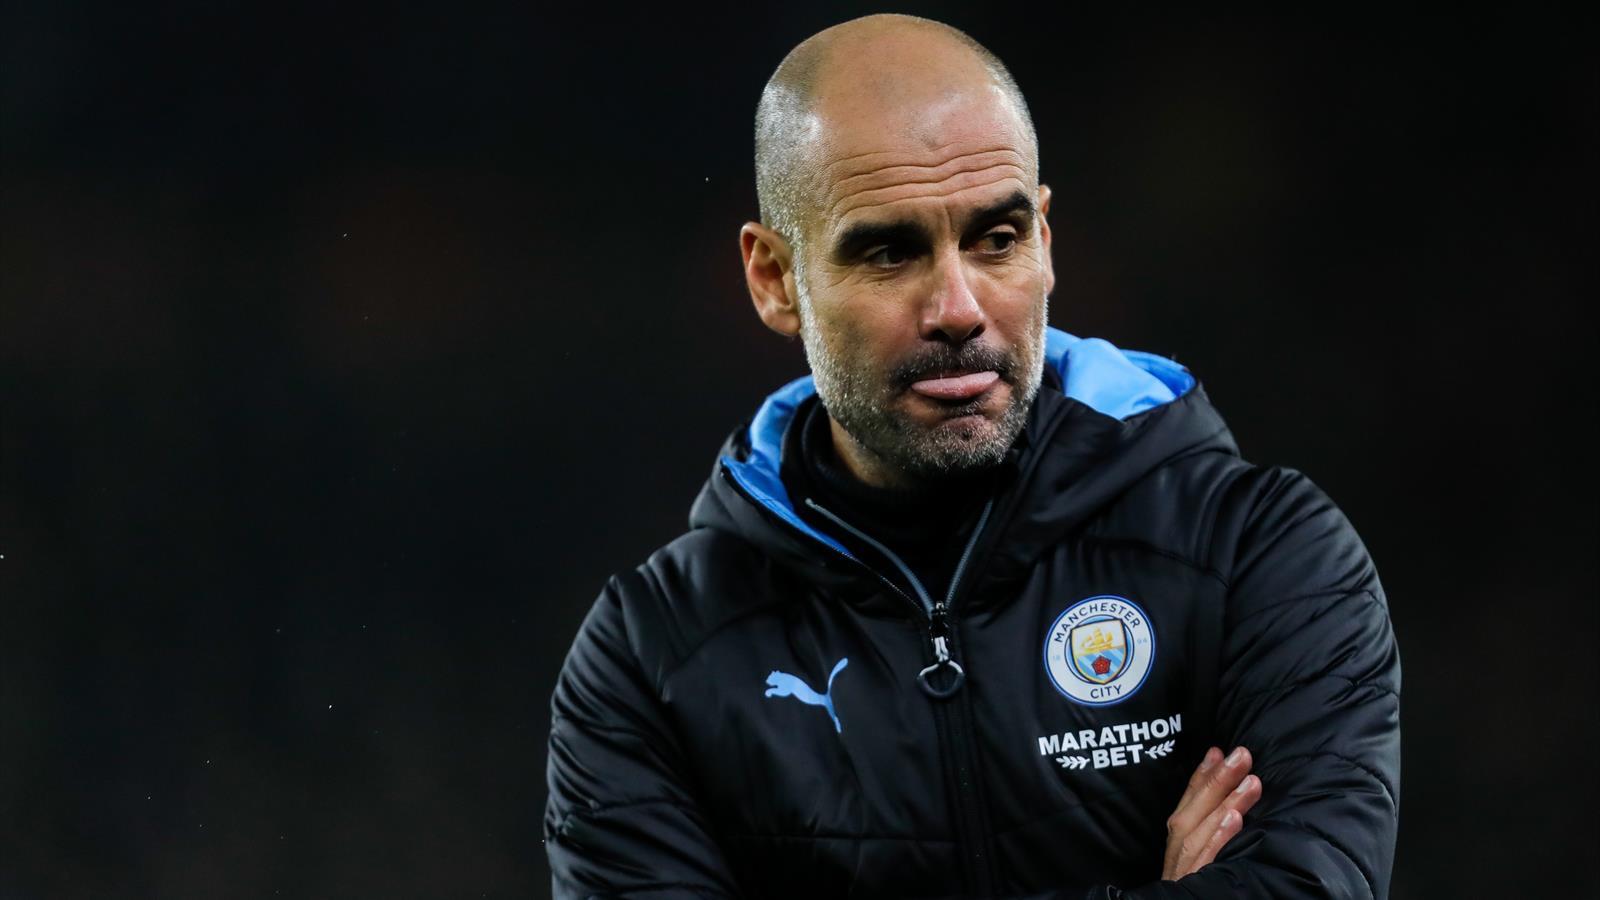 Пеп Гвардиола тренер Манчестер Сити